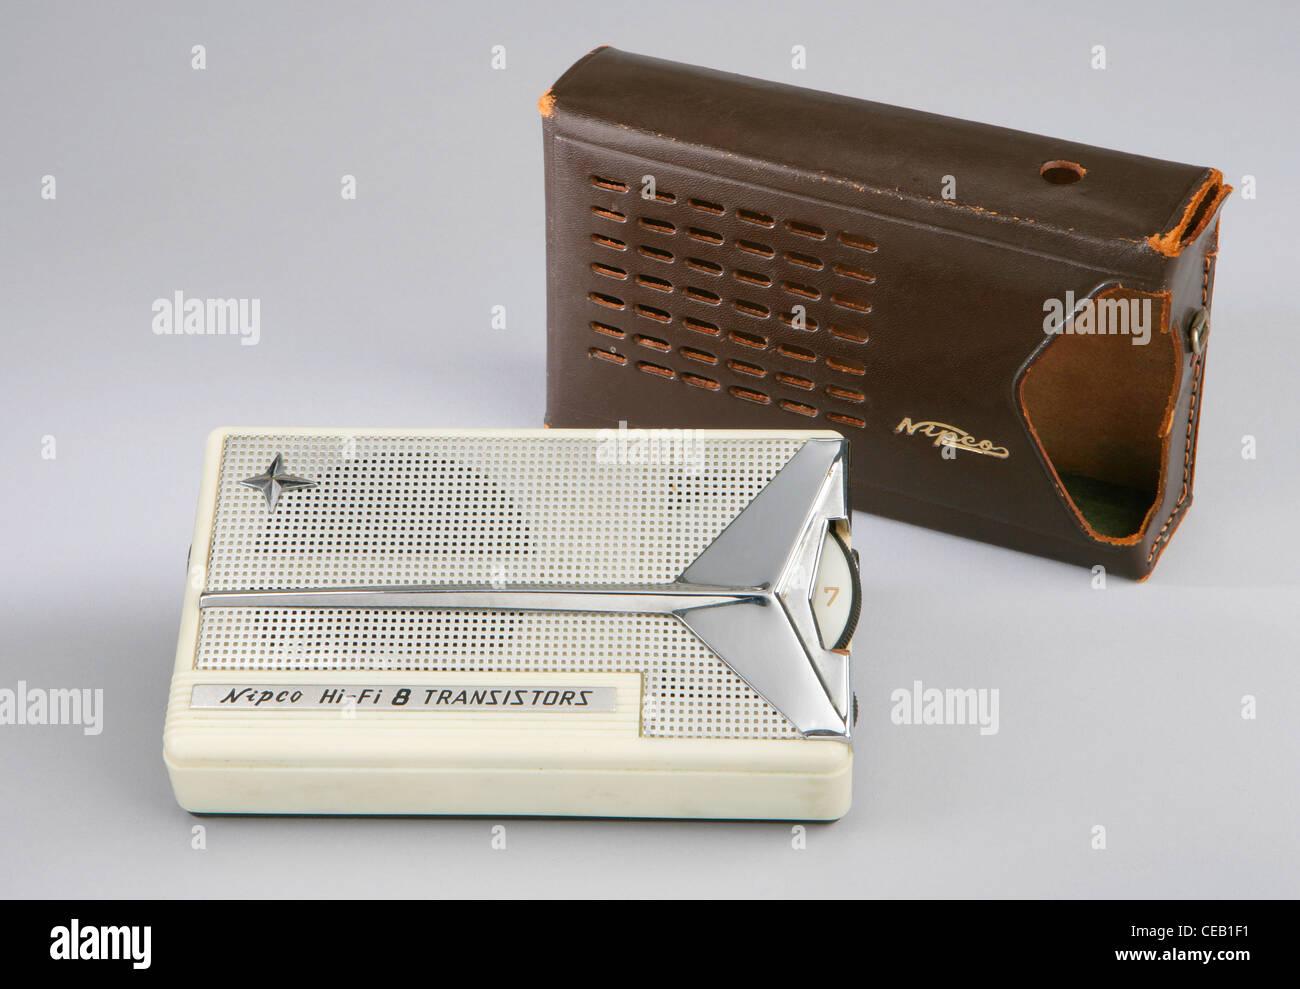 Transistor Radio 1958 - Stock Image